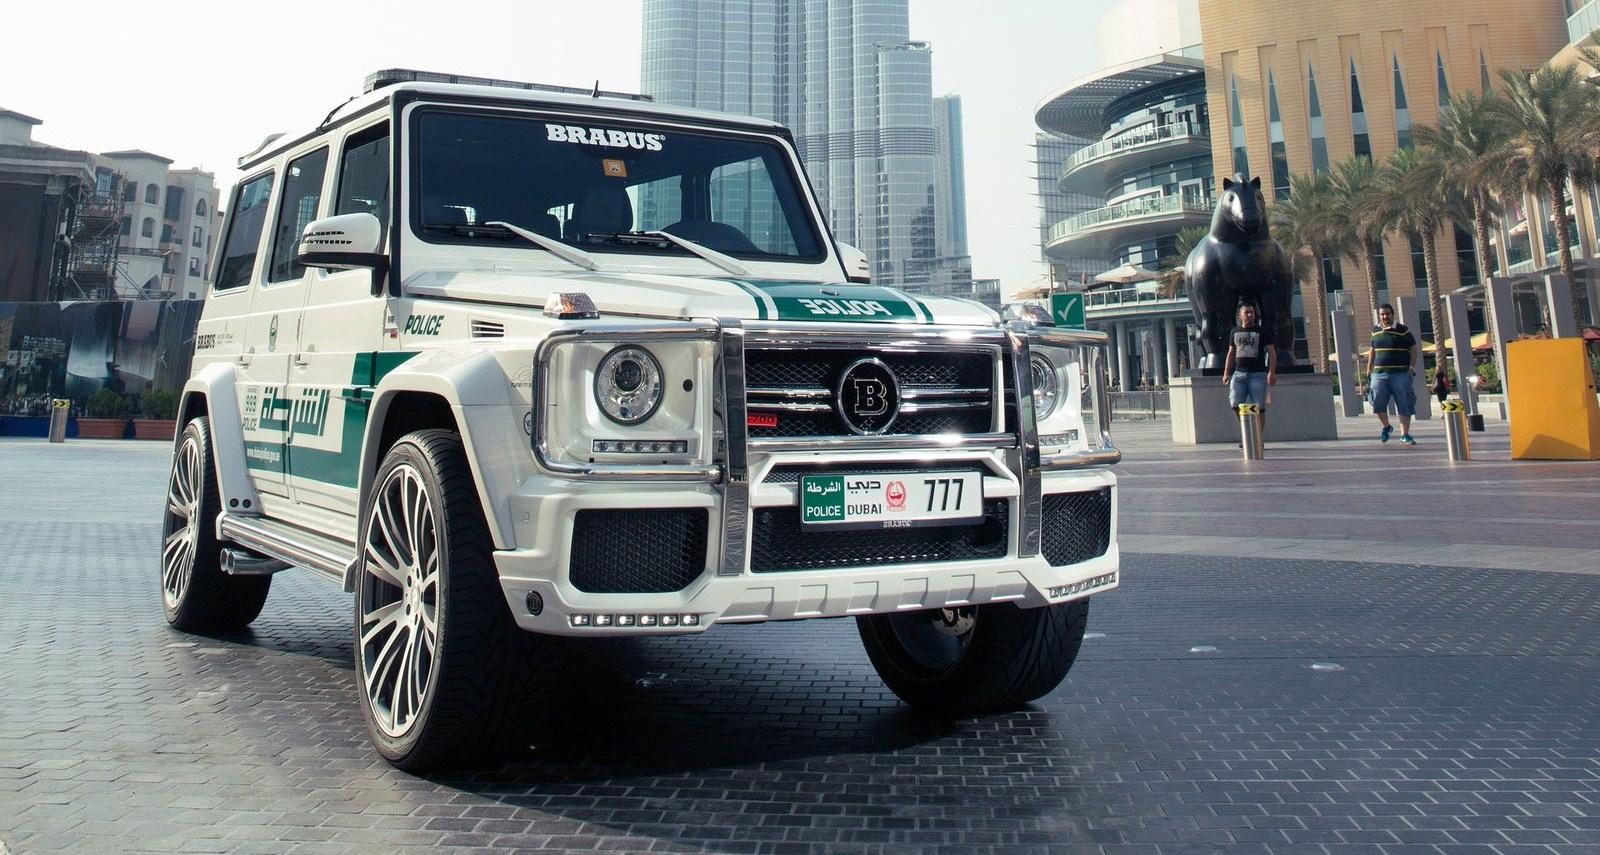 Lexus El Monte >> Mercedes Cars-News: Dubai Police's Brabus B63S-700 Widestar